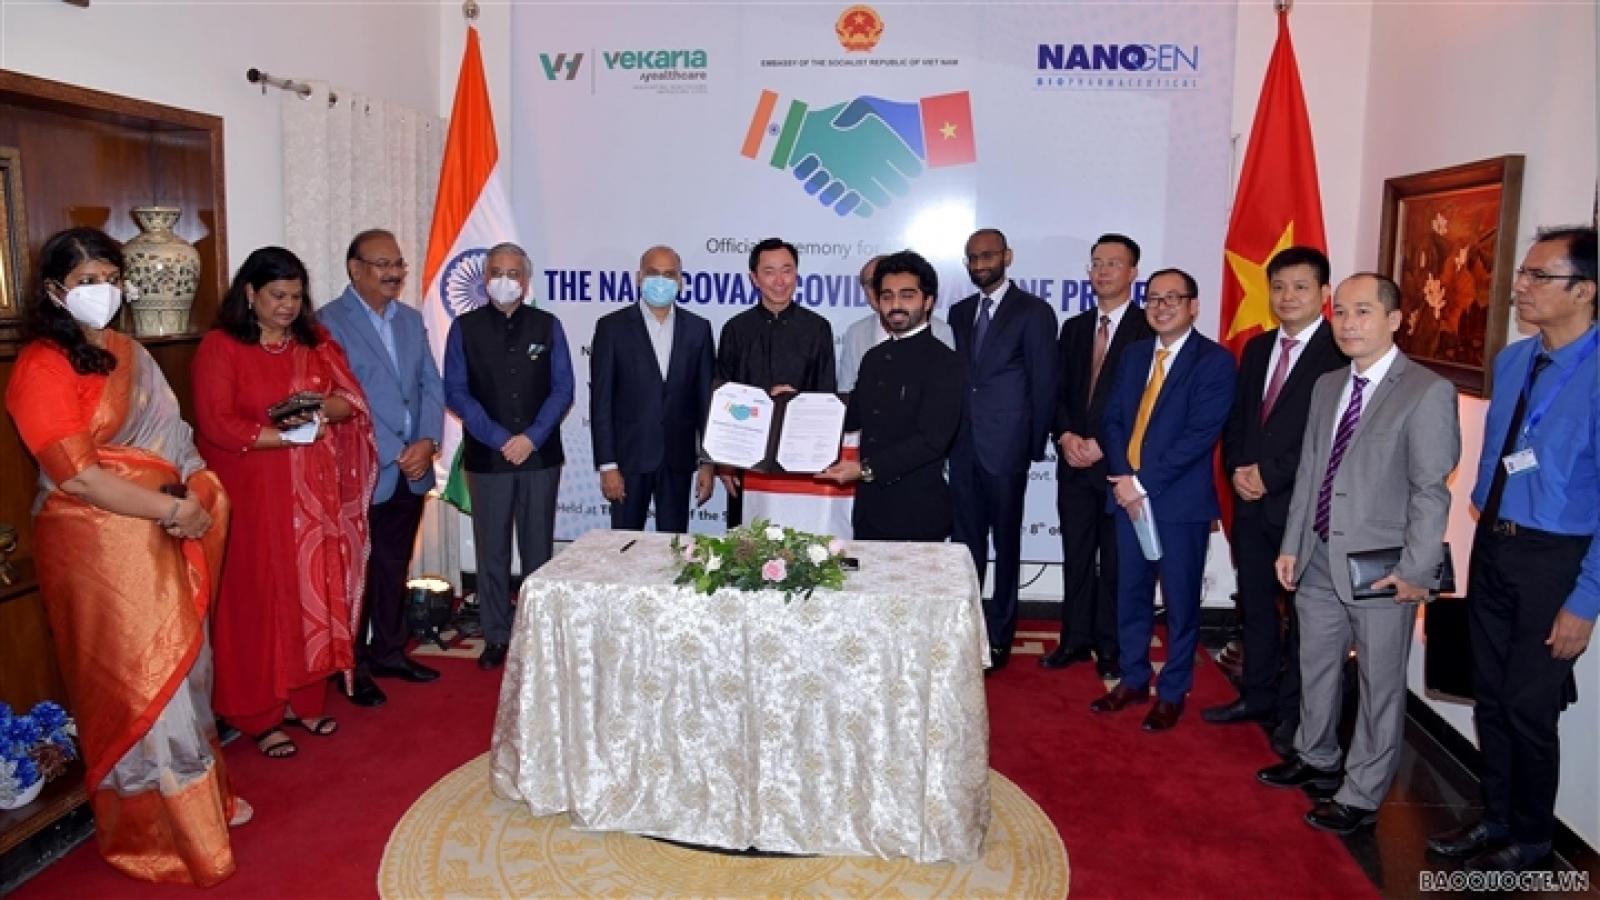 Indian company partners with Nanogen to distribute Nano Covax vaccine